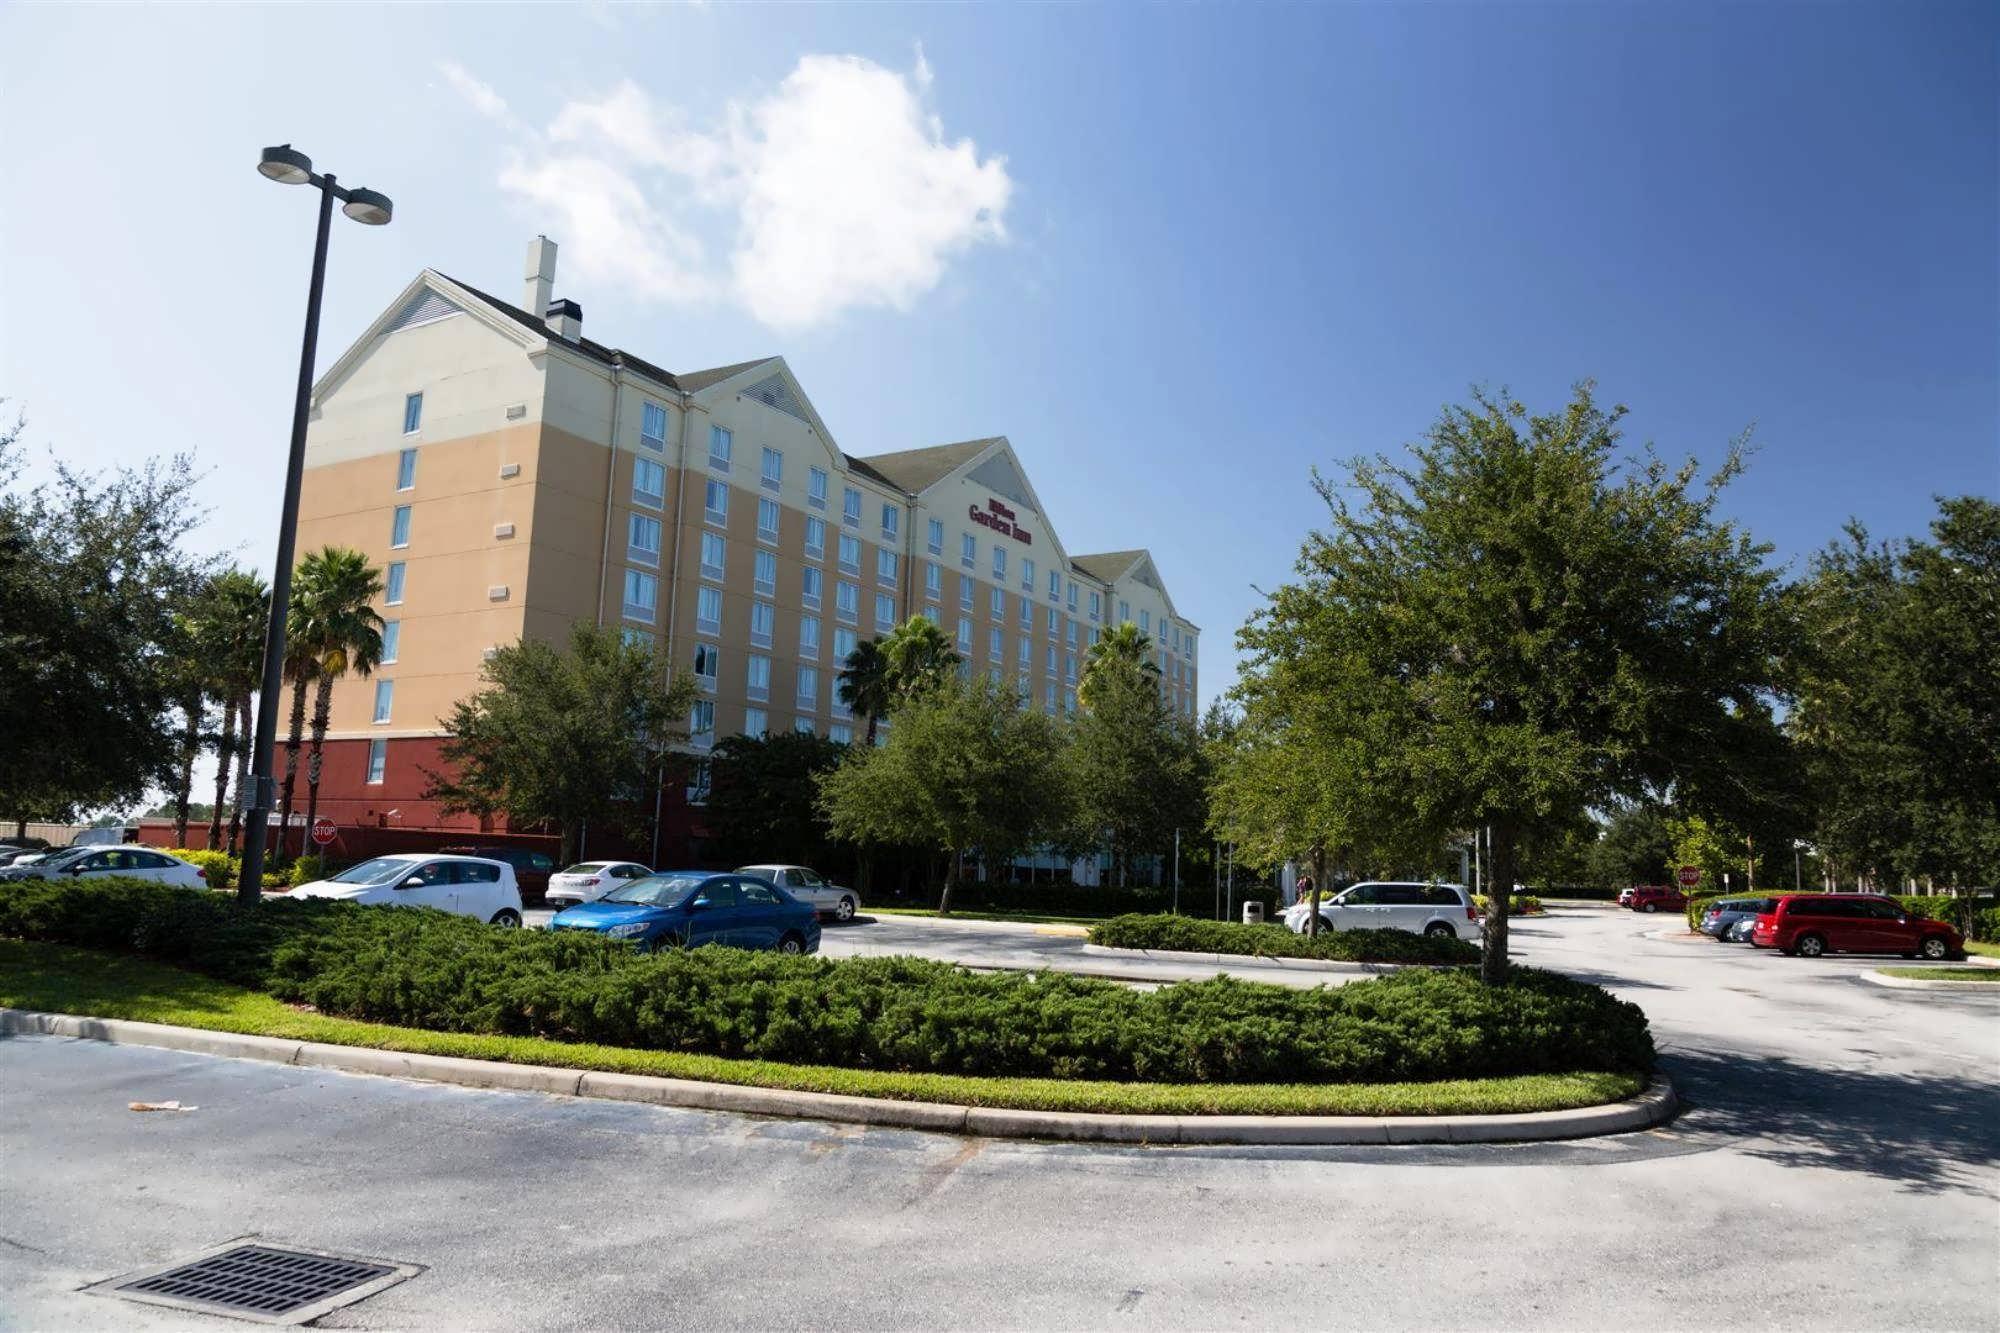 Hilton Garden Inn Orlando At Seaworld It 39 S Earned My Seal Of Excellence And Tripadvisor 39 S Too